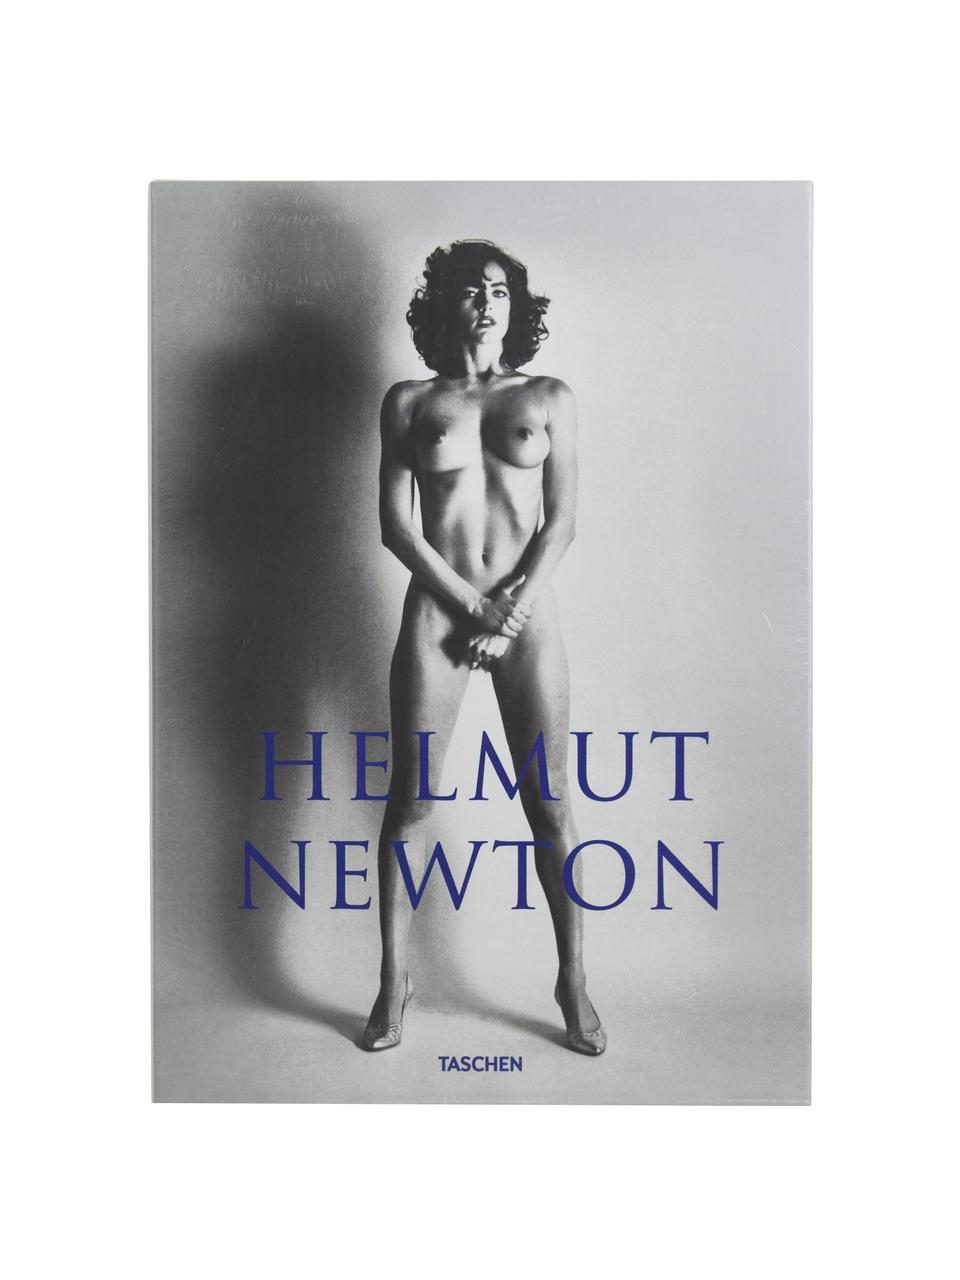 Libro illustrato Helmut Newton – Sumo, Carta, copertina rigida, Grigio, blu, Lung. 37 x Larg. 27 cm